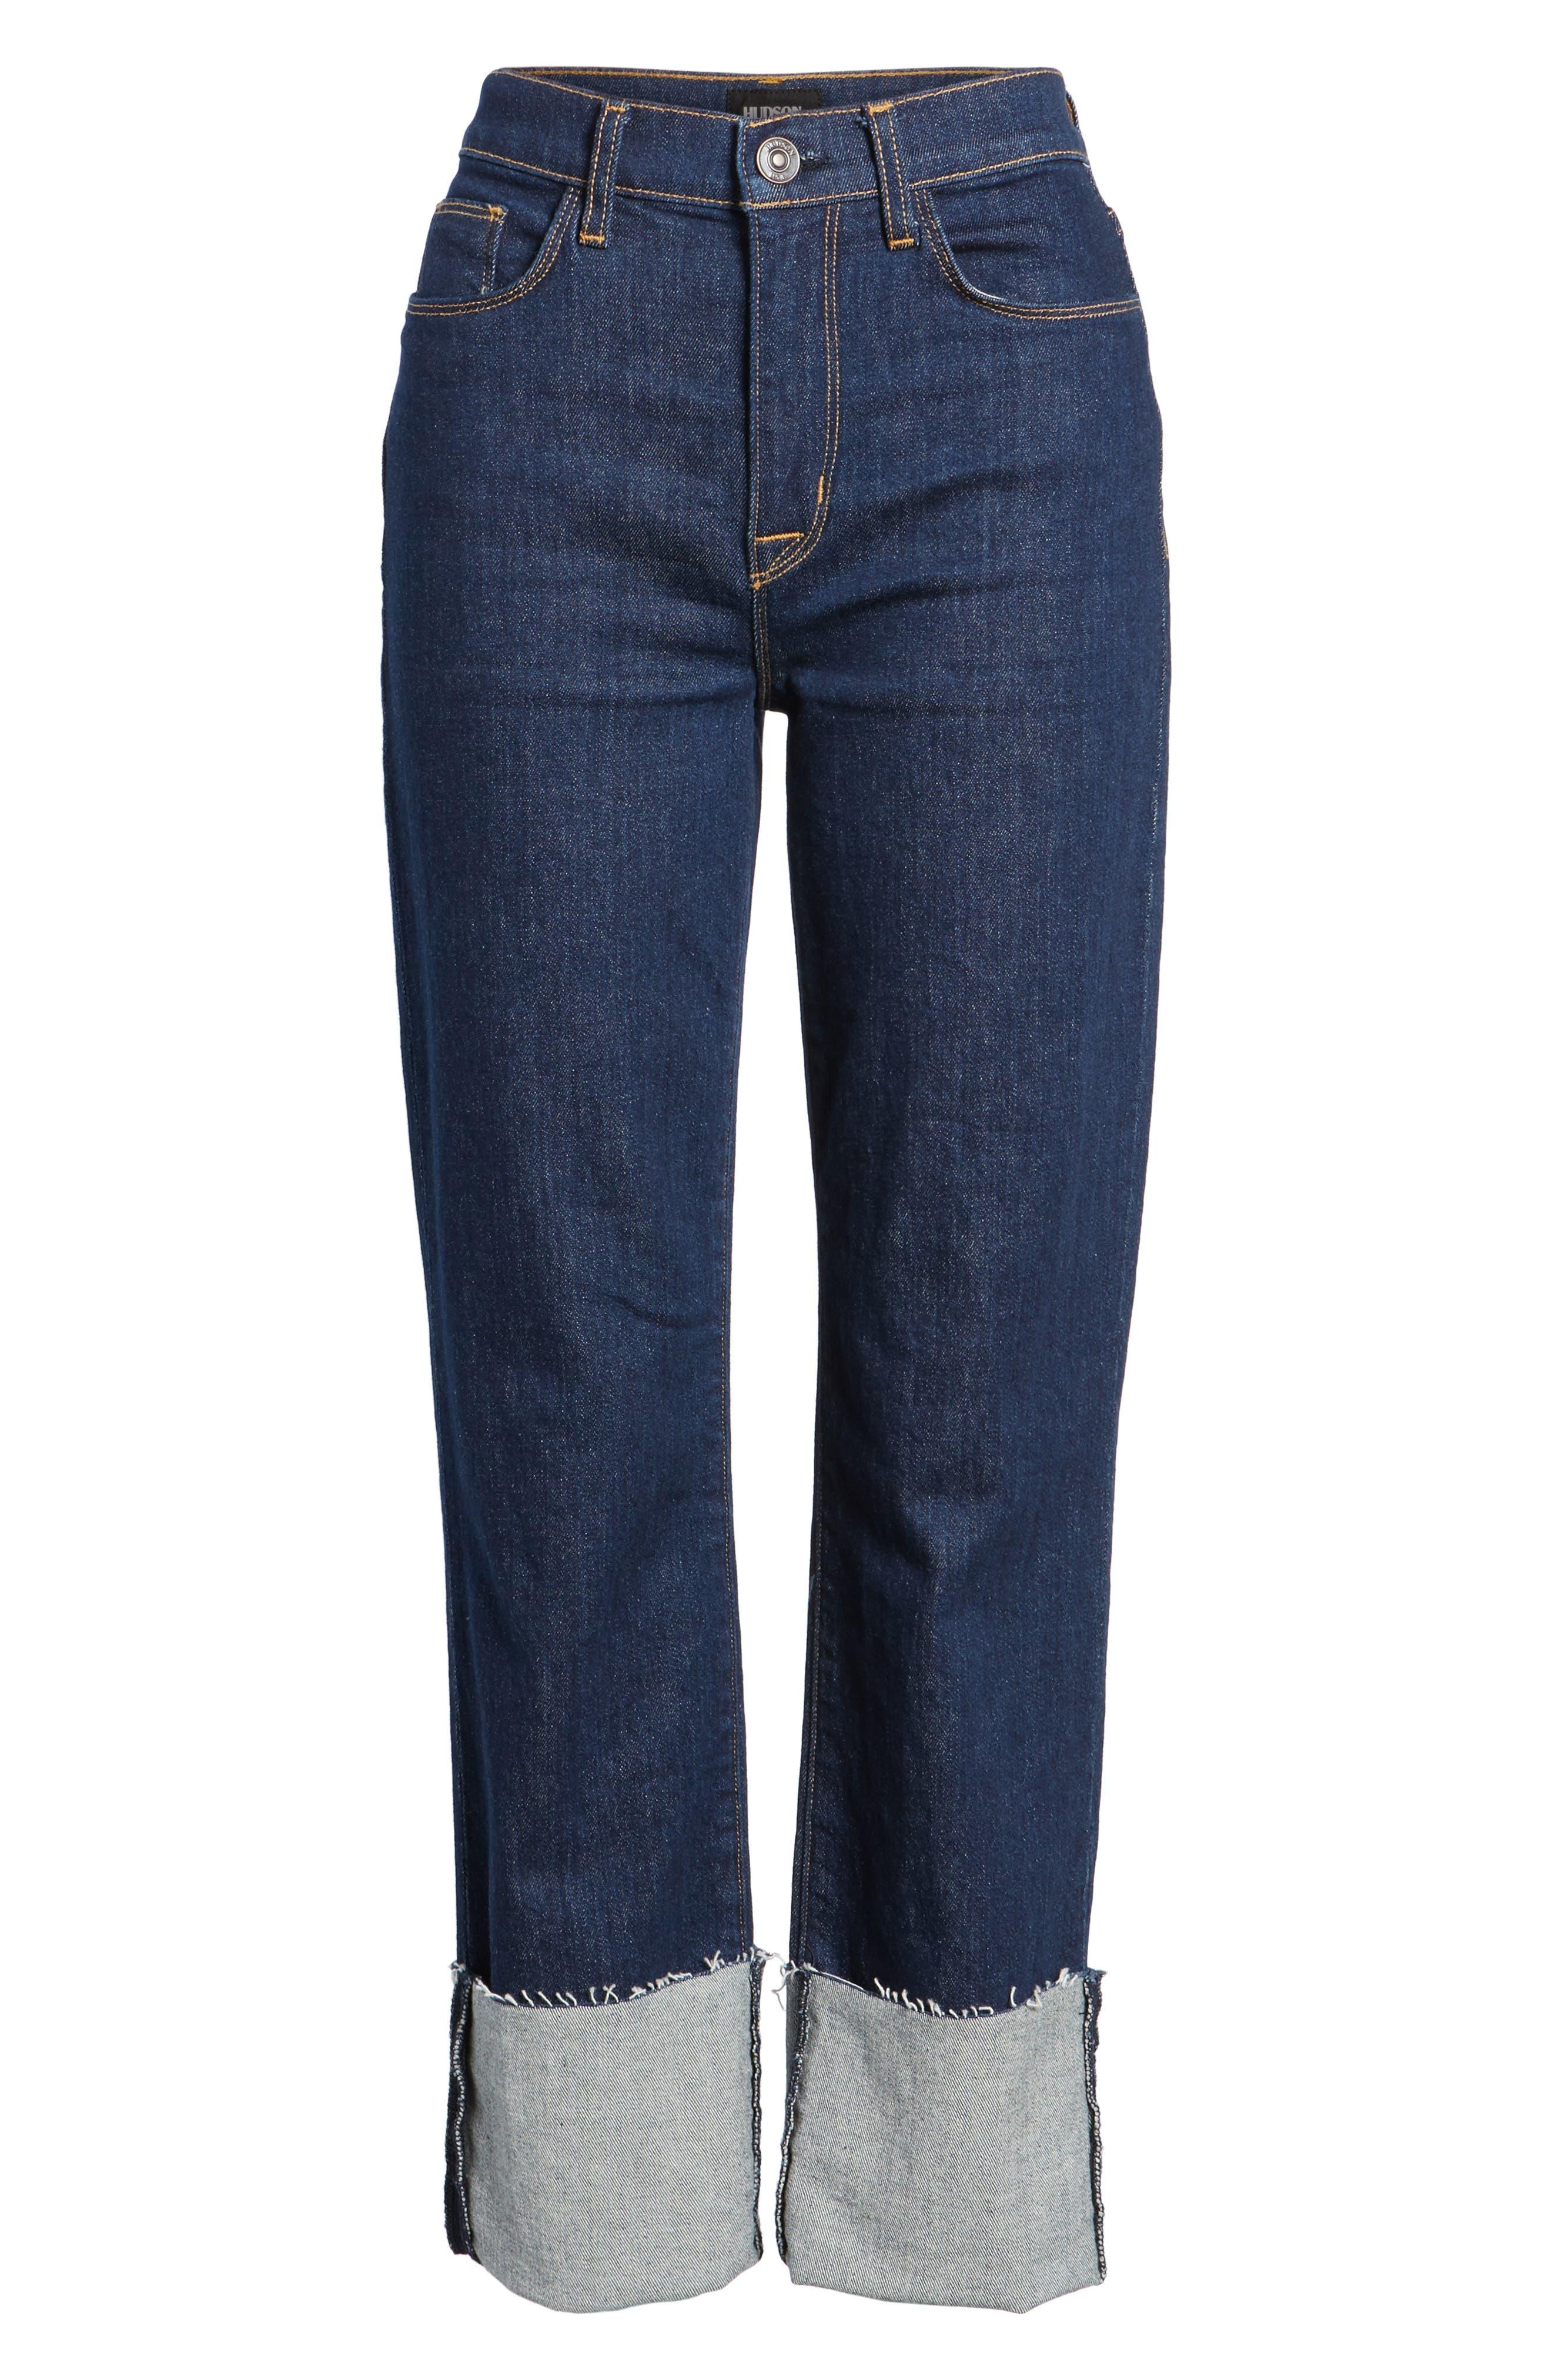 Zoeey High Waist Crop Straight Leg Jeans,                             Alternate thumbnail 17, color,